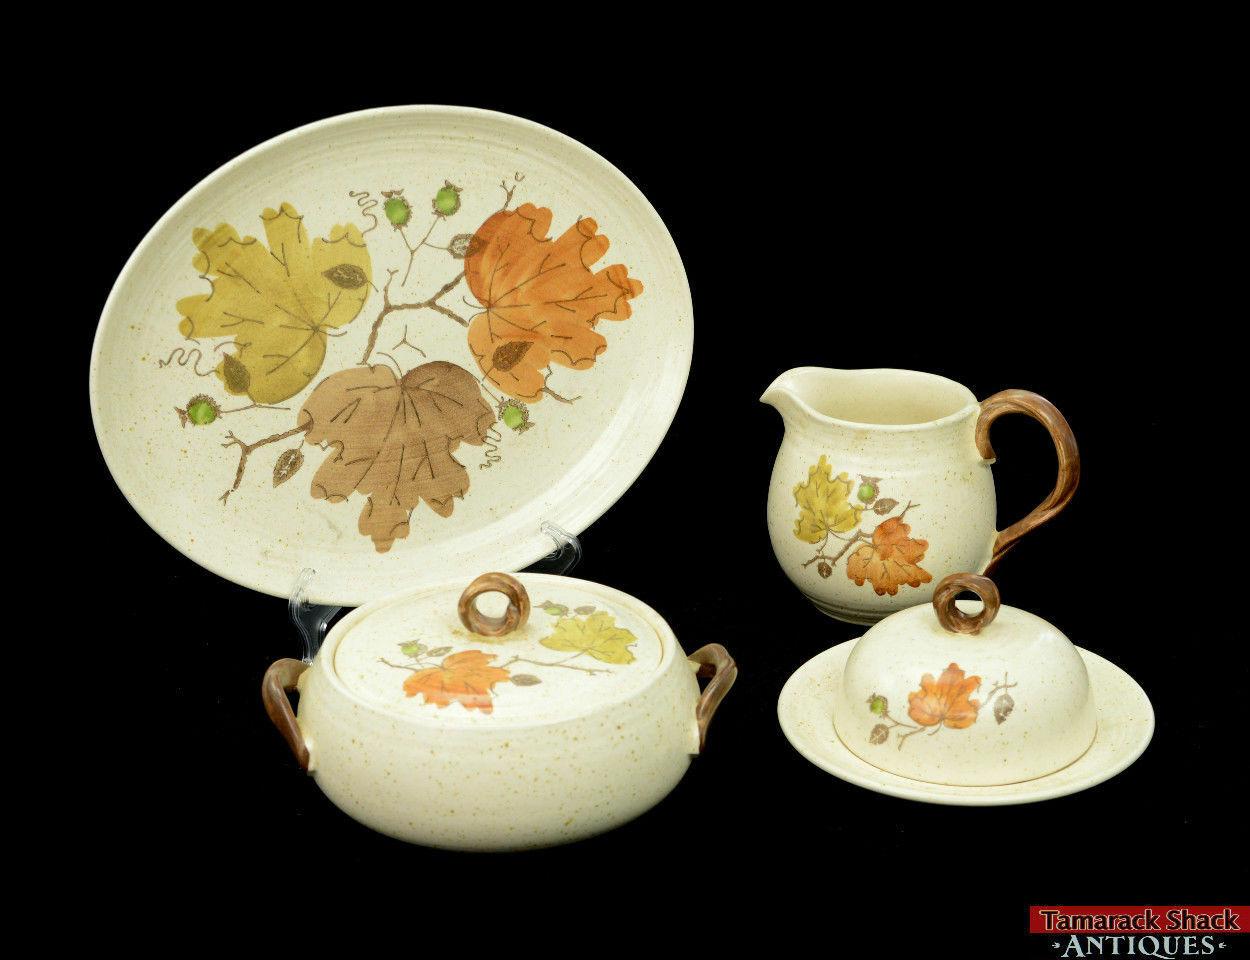 VTG-6-pc-Metlox-Poppytrail-Woodland-Gold-Pitcher-Vegetable-Bowl-Serving-Platter-291536637106-2.jpg